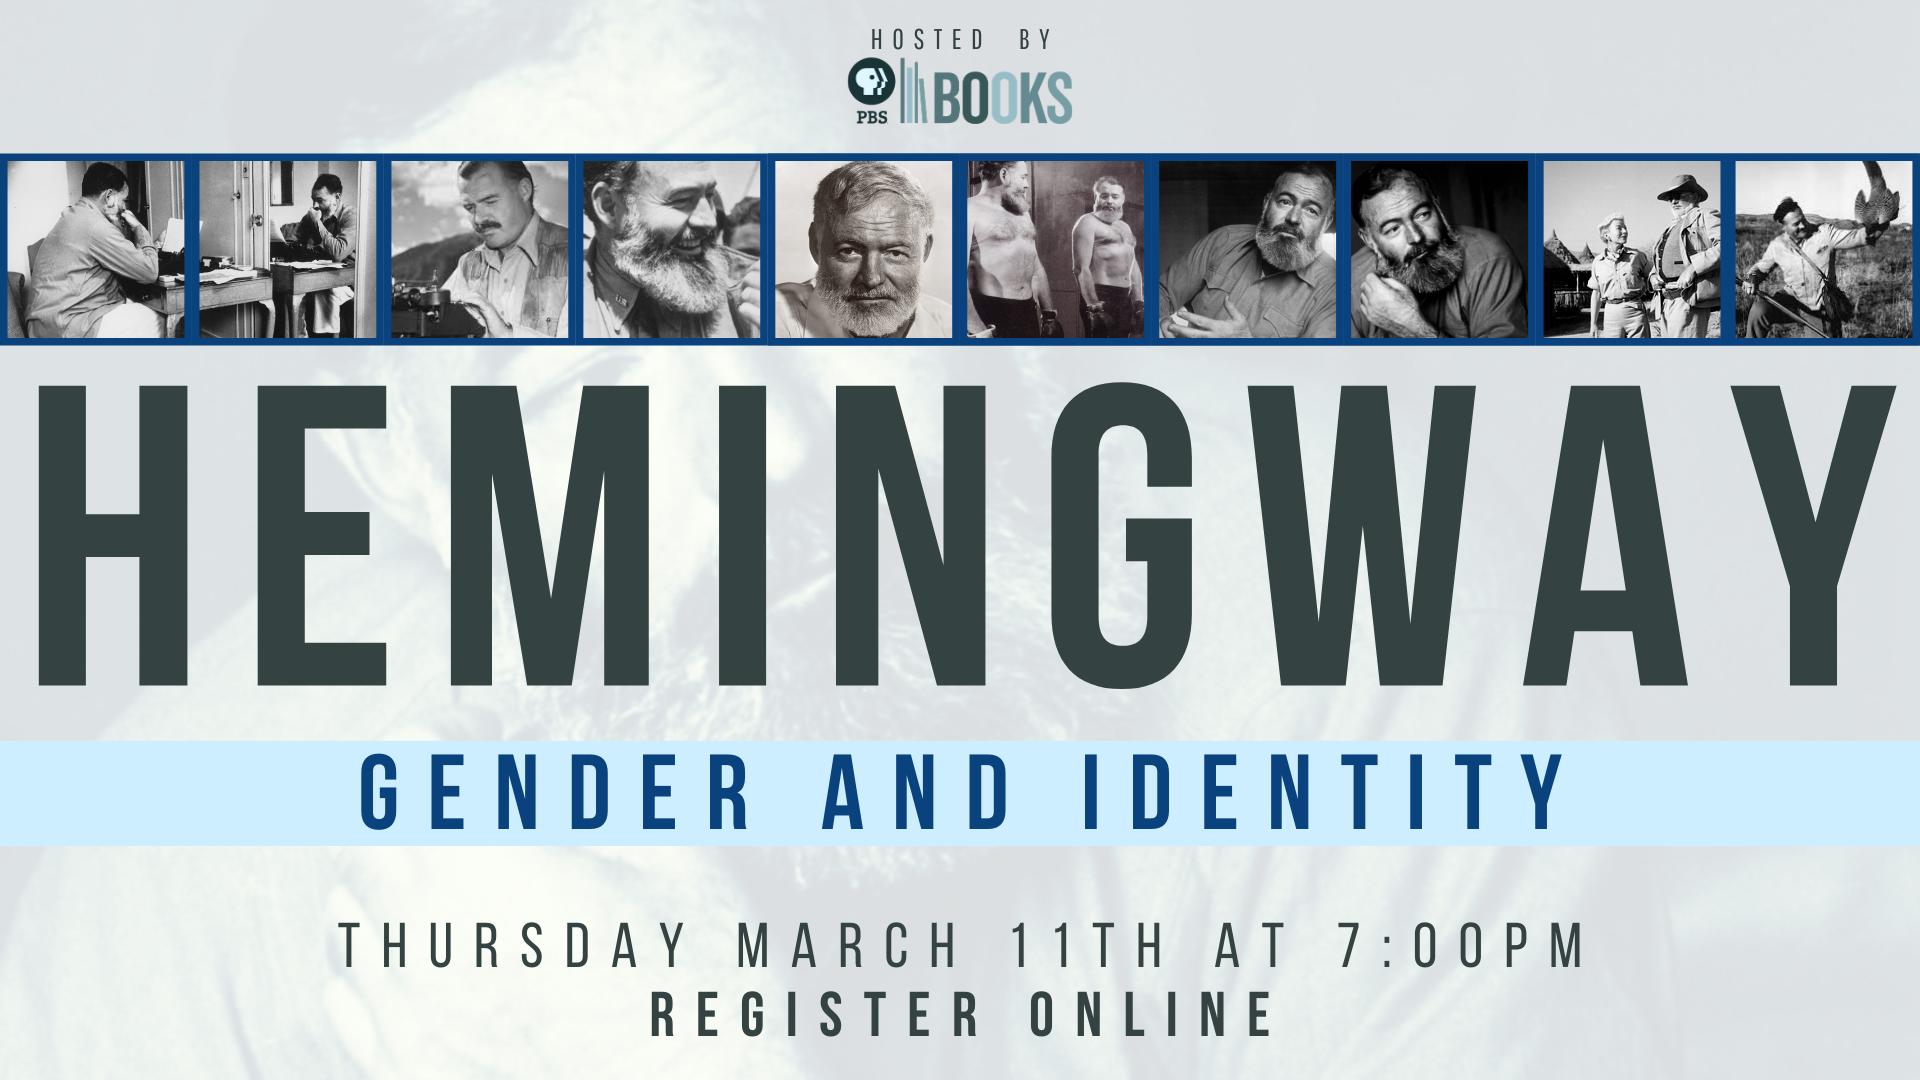 Hemingway, Gender and Identity